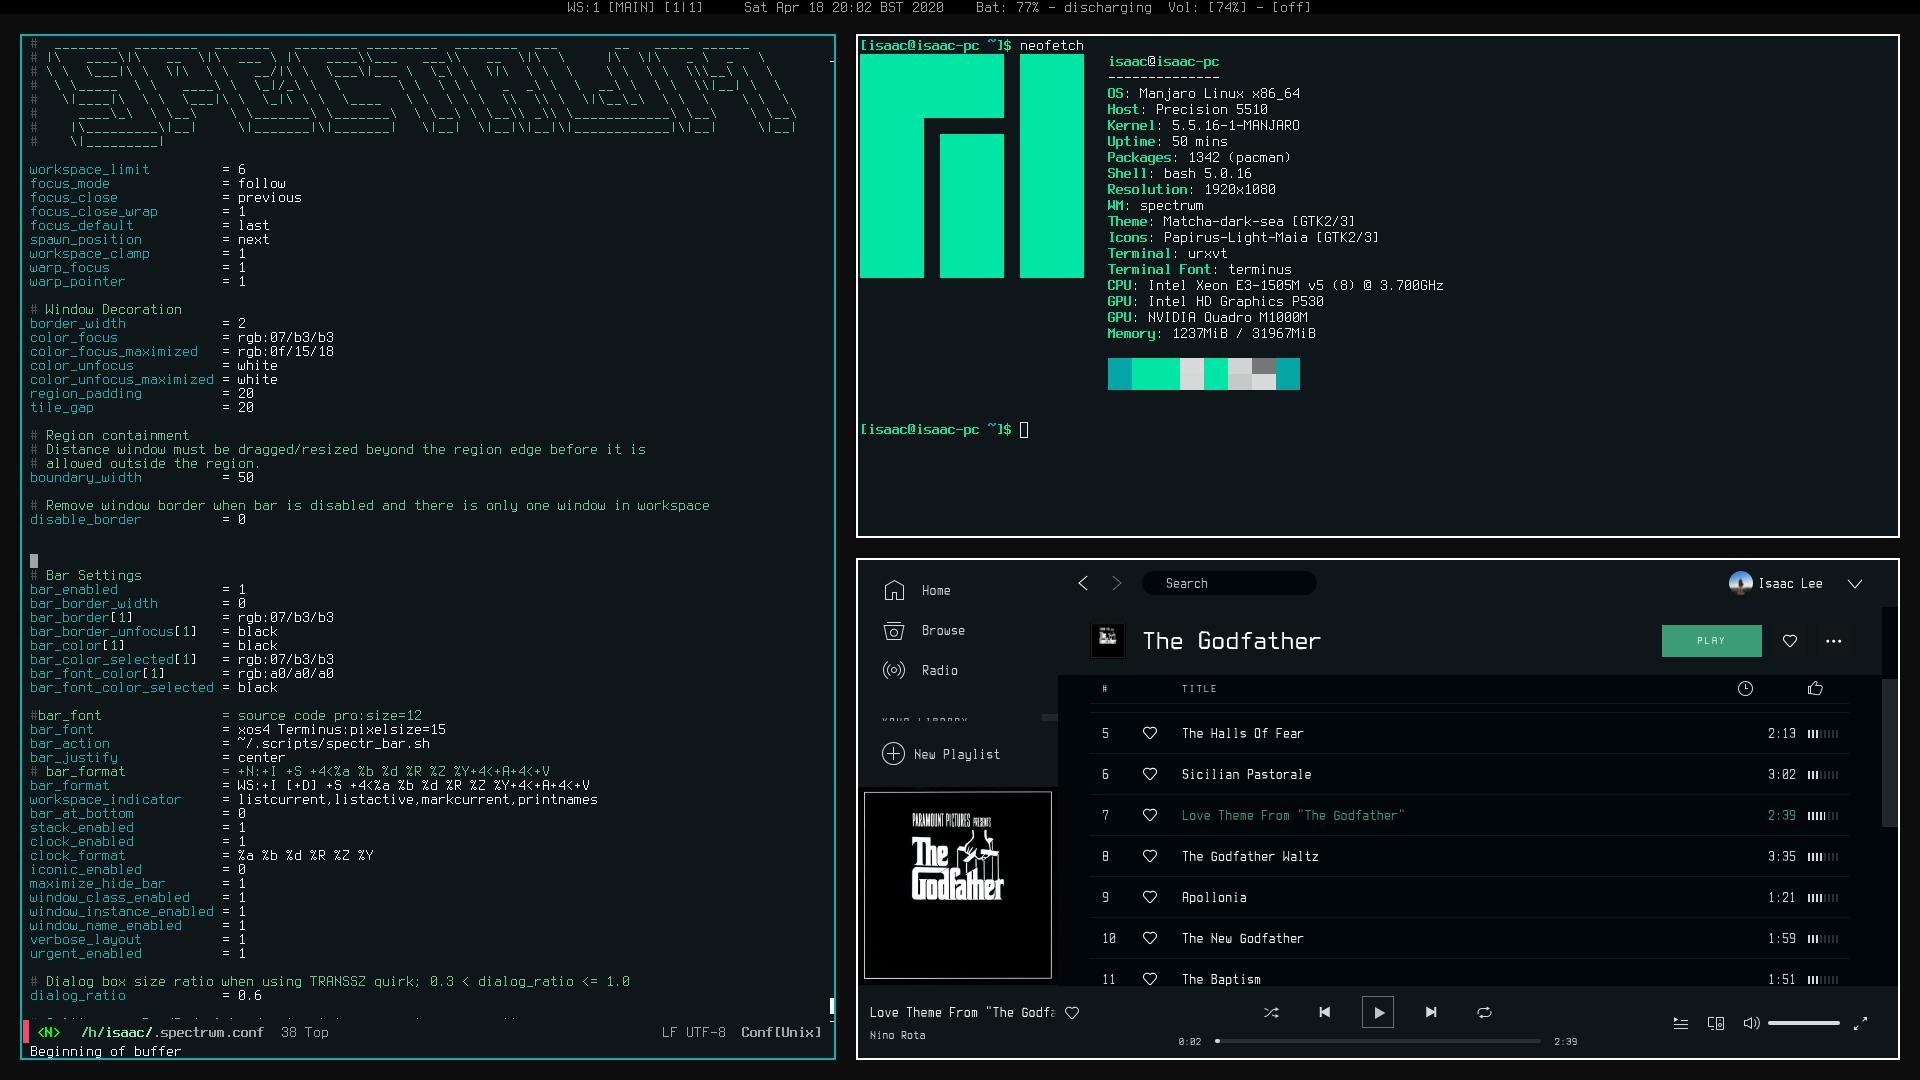 Best Linux Distro And Desktop Environment Combinations